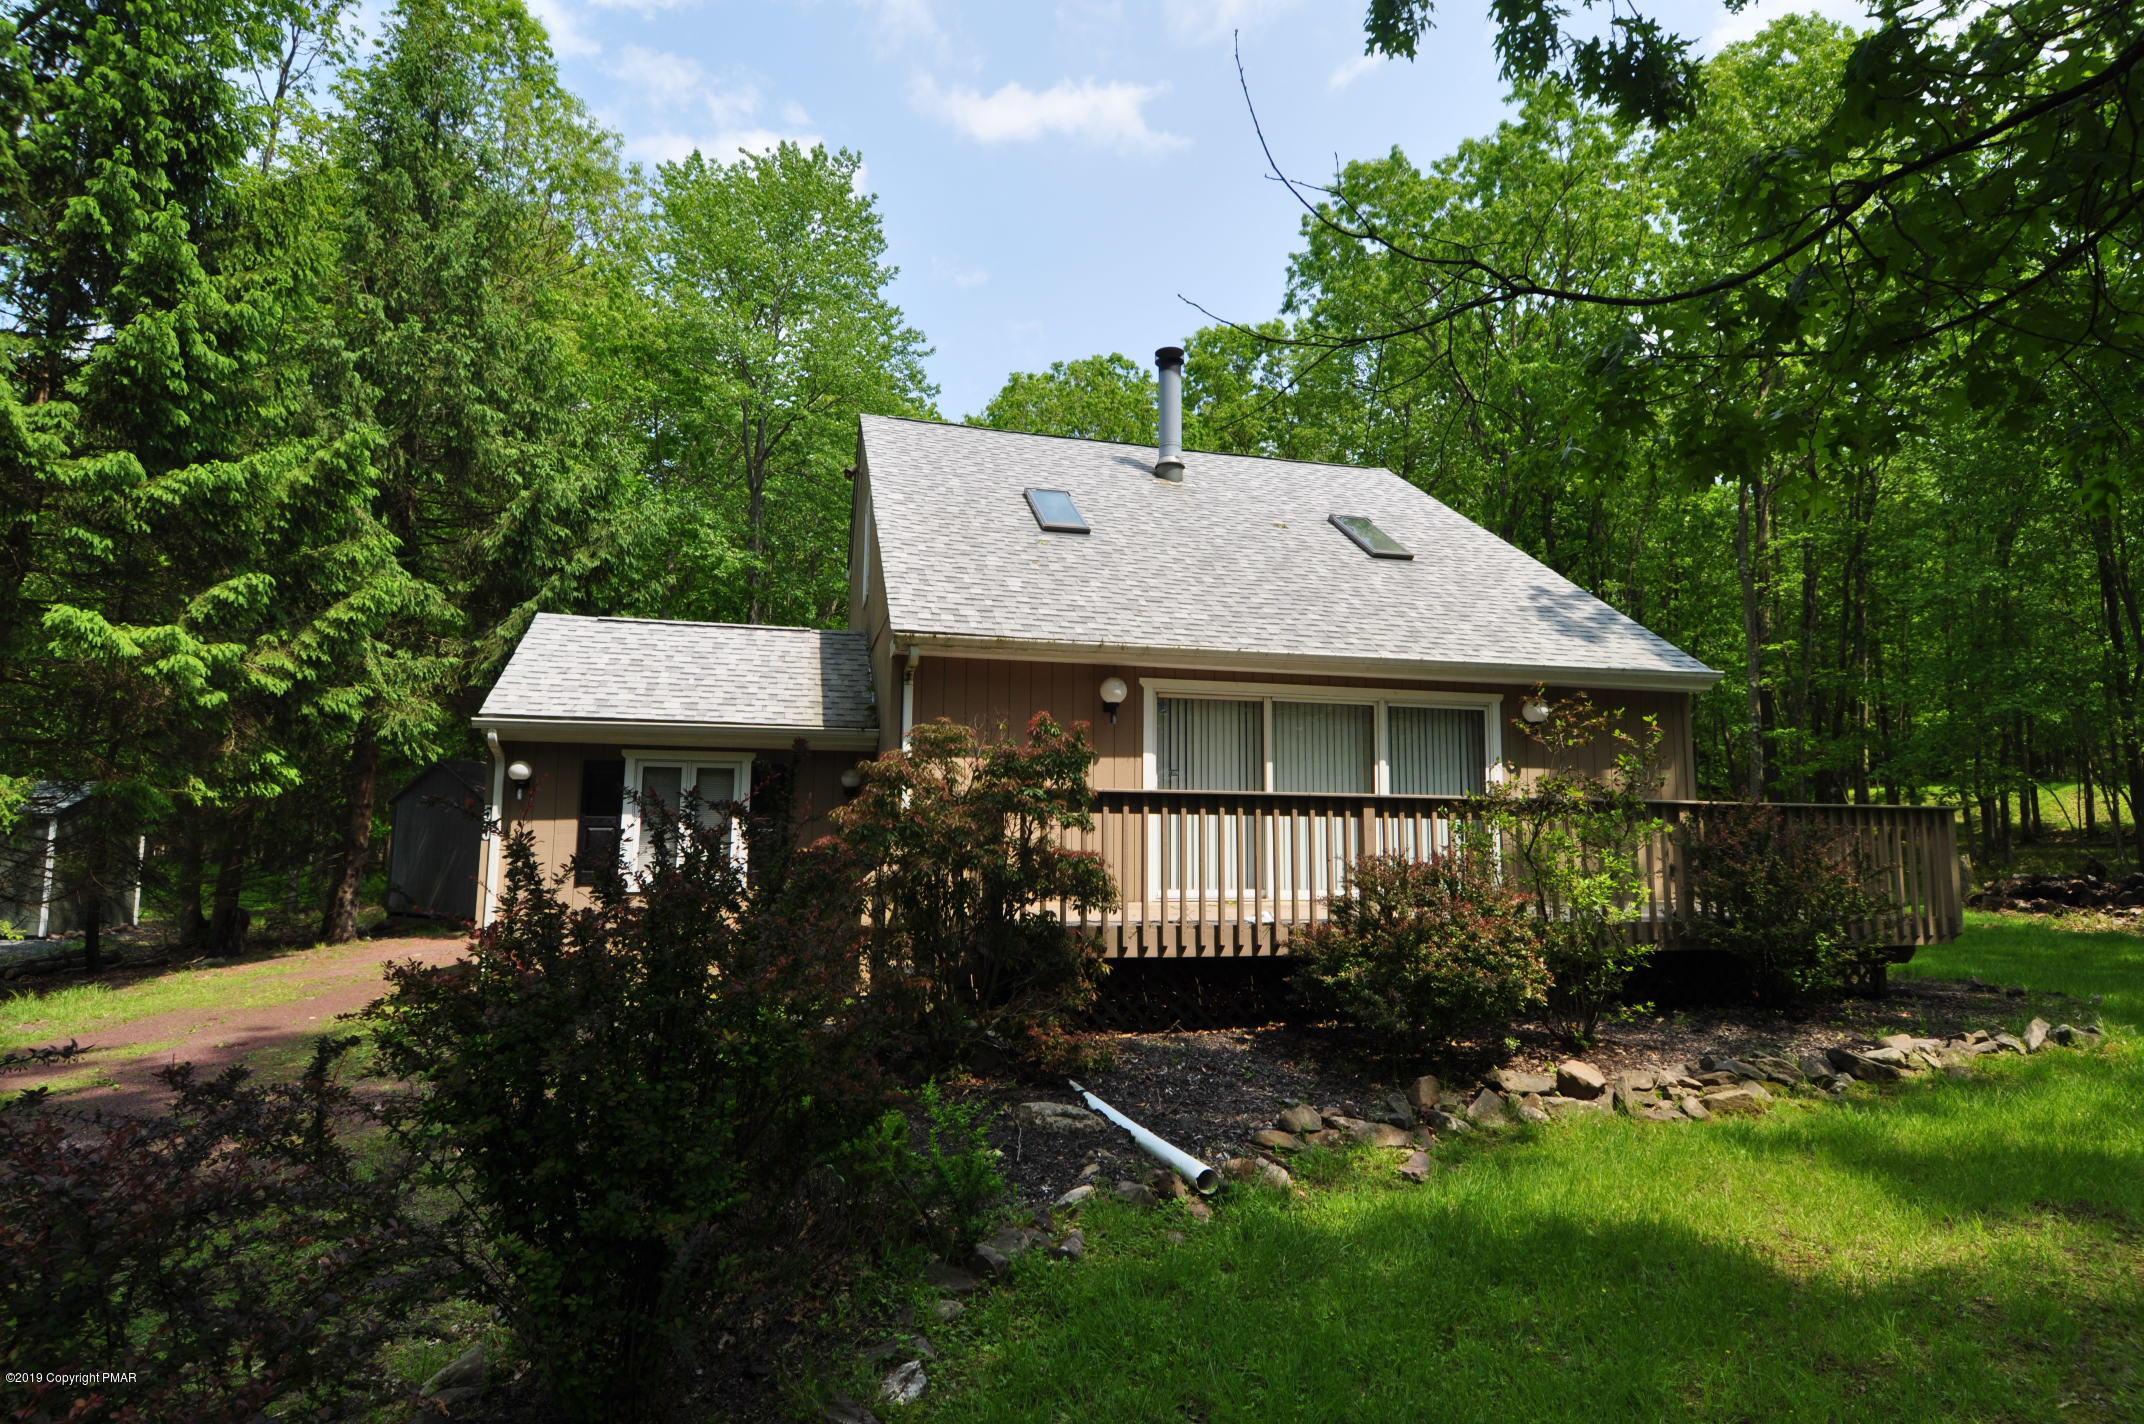 56 Thomas Ln, Albrightsville, PA 18210